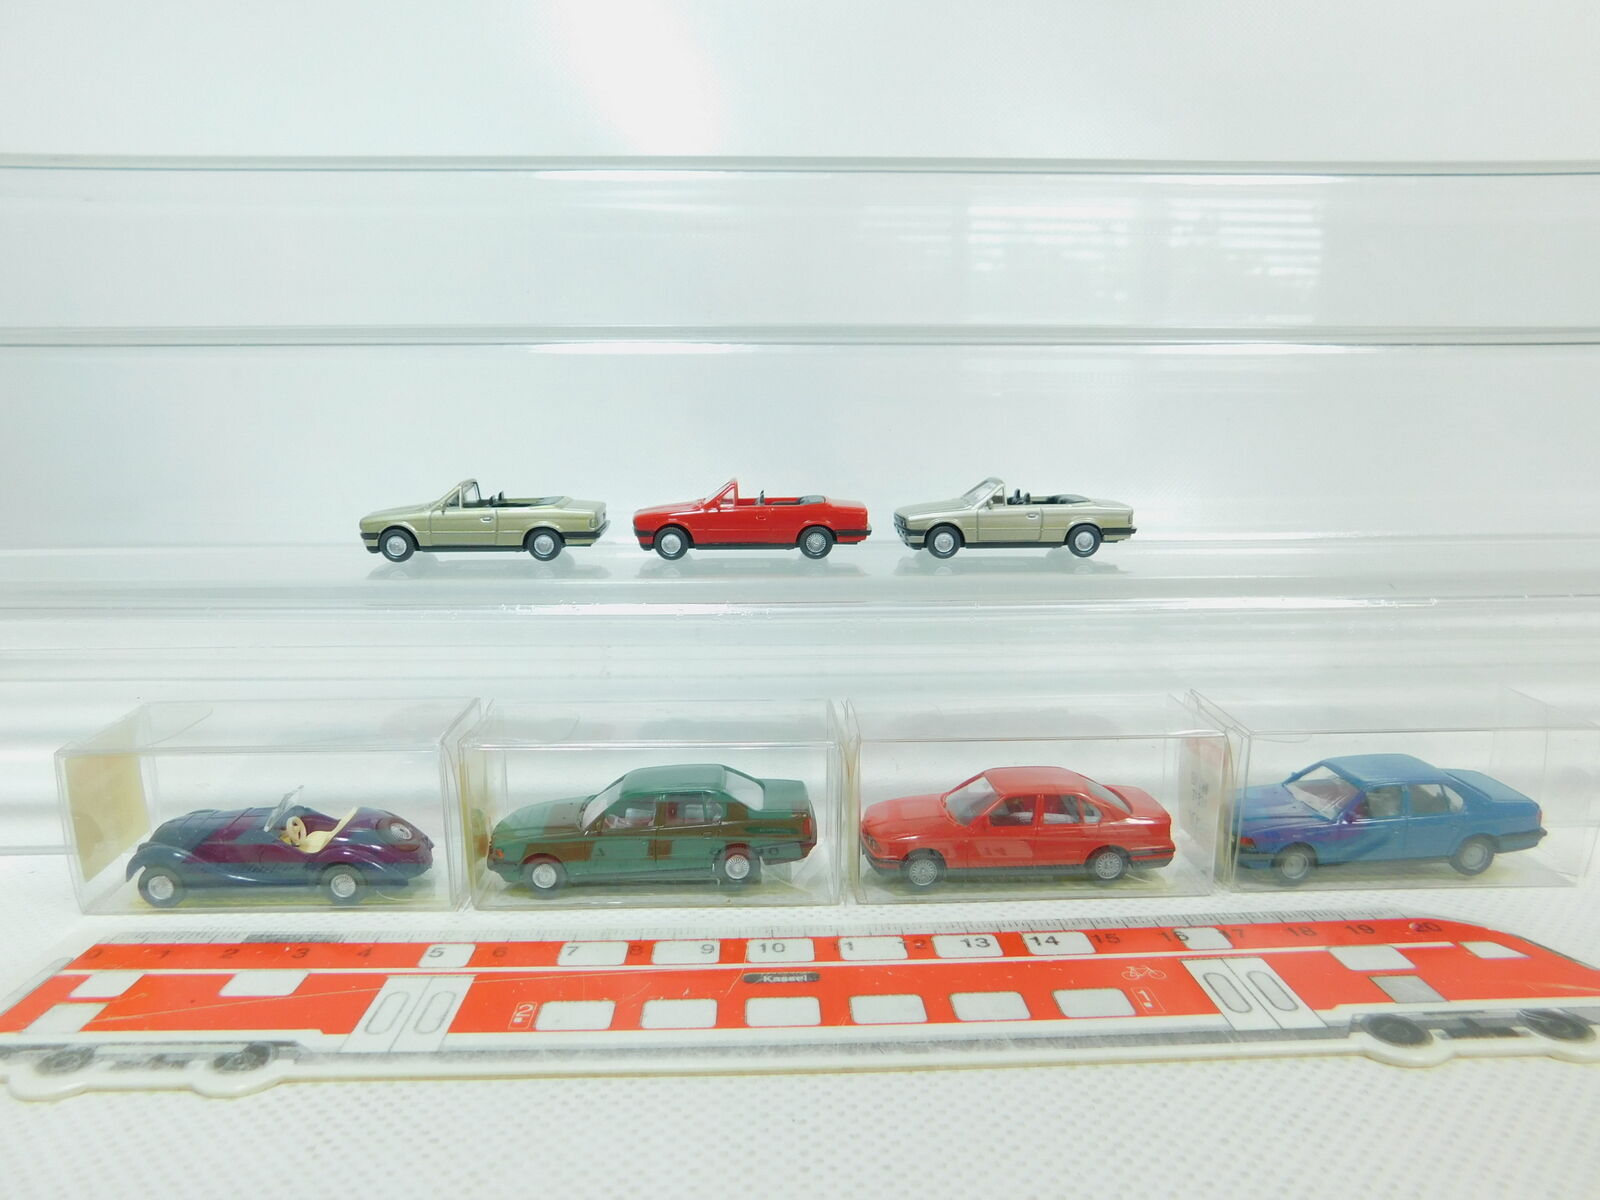 Bn102-0, 5  7x WIKING h0 1 87 Voiture Modèle BMW 325  520  750  328, Neuw 4x Neuf dans sa boîte